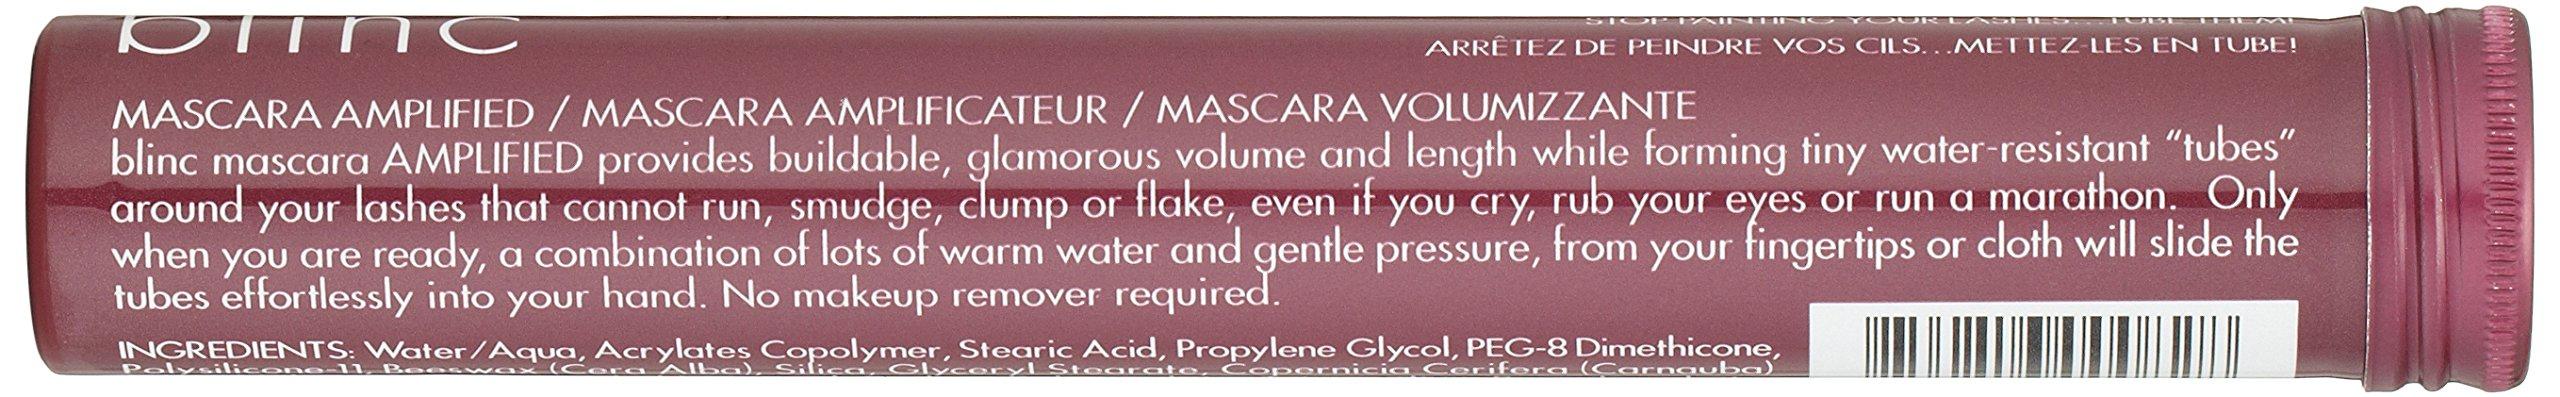 blinc Mascara Amplified, Black by blinc (Image #11)